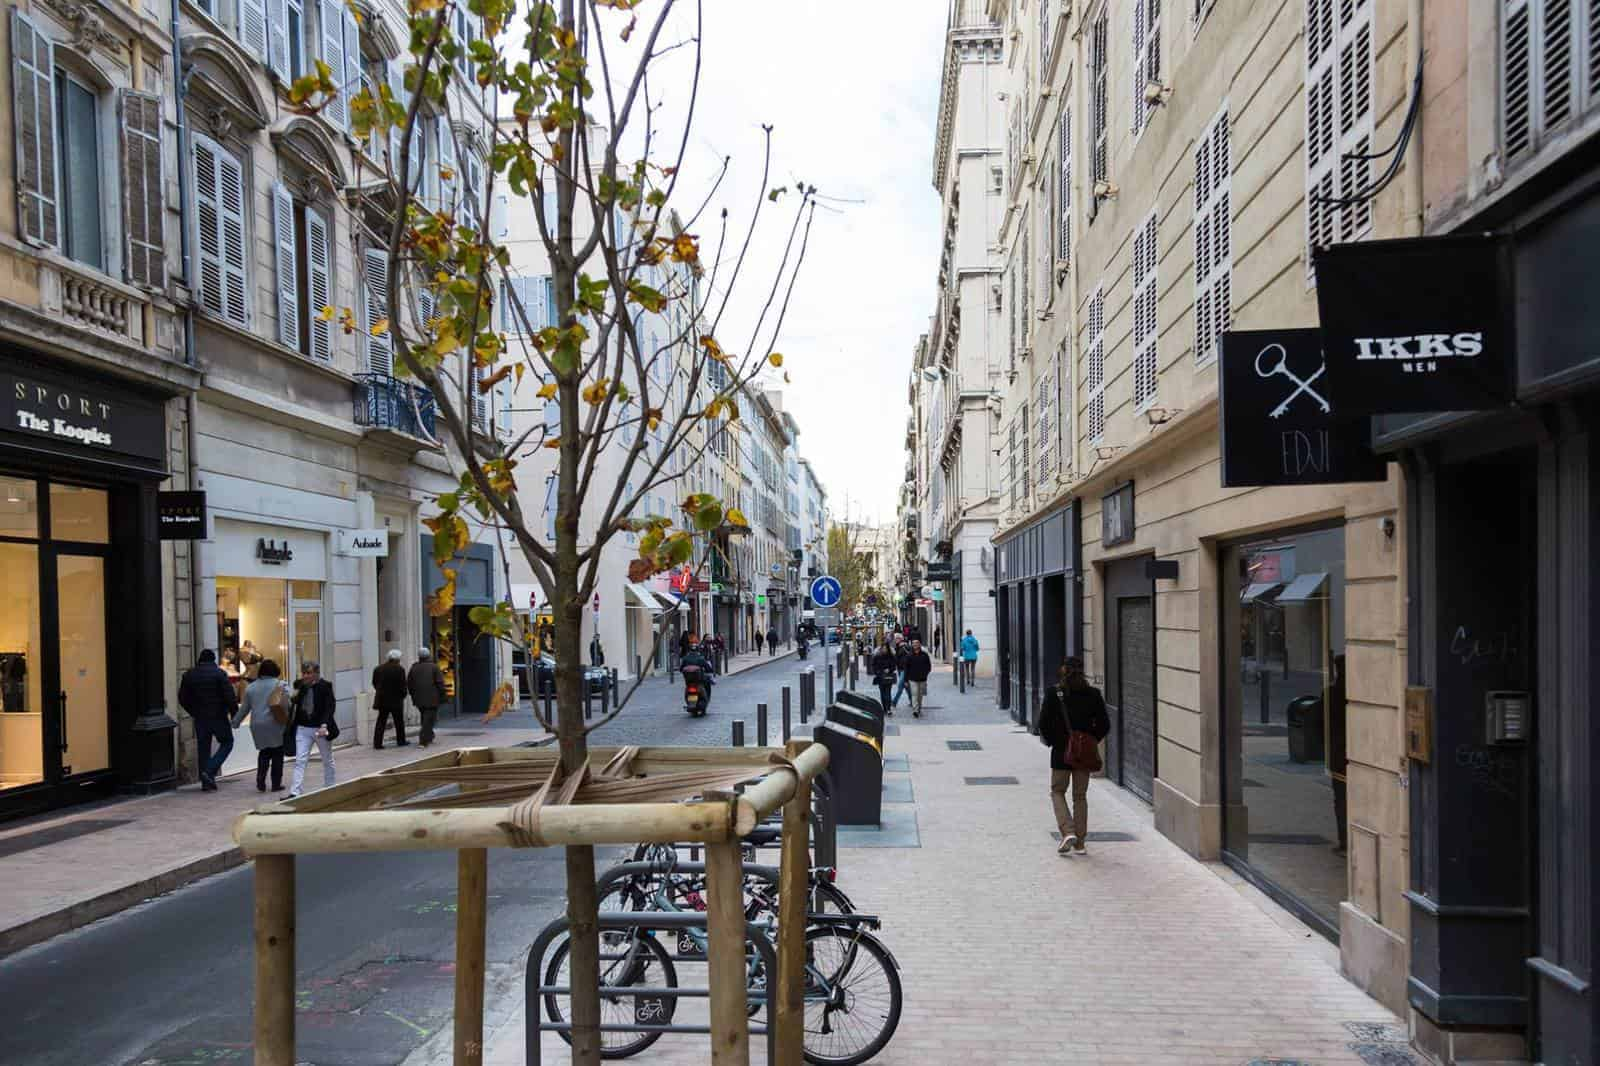 rue-paradis-marseille